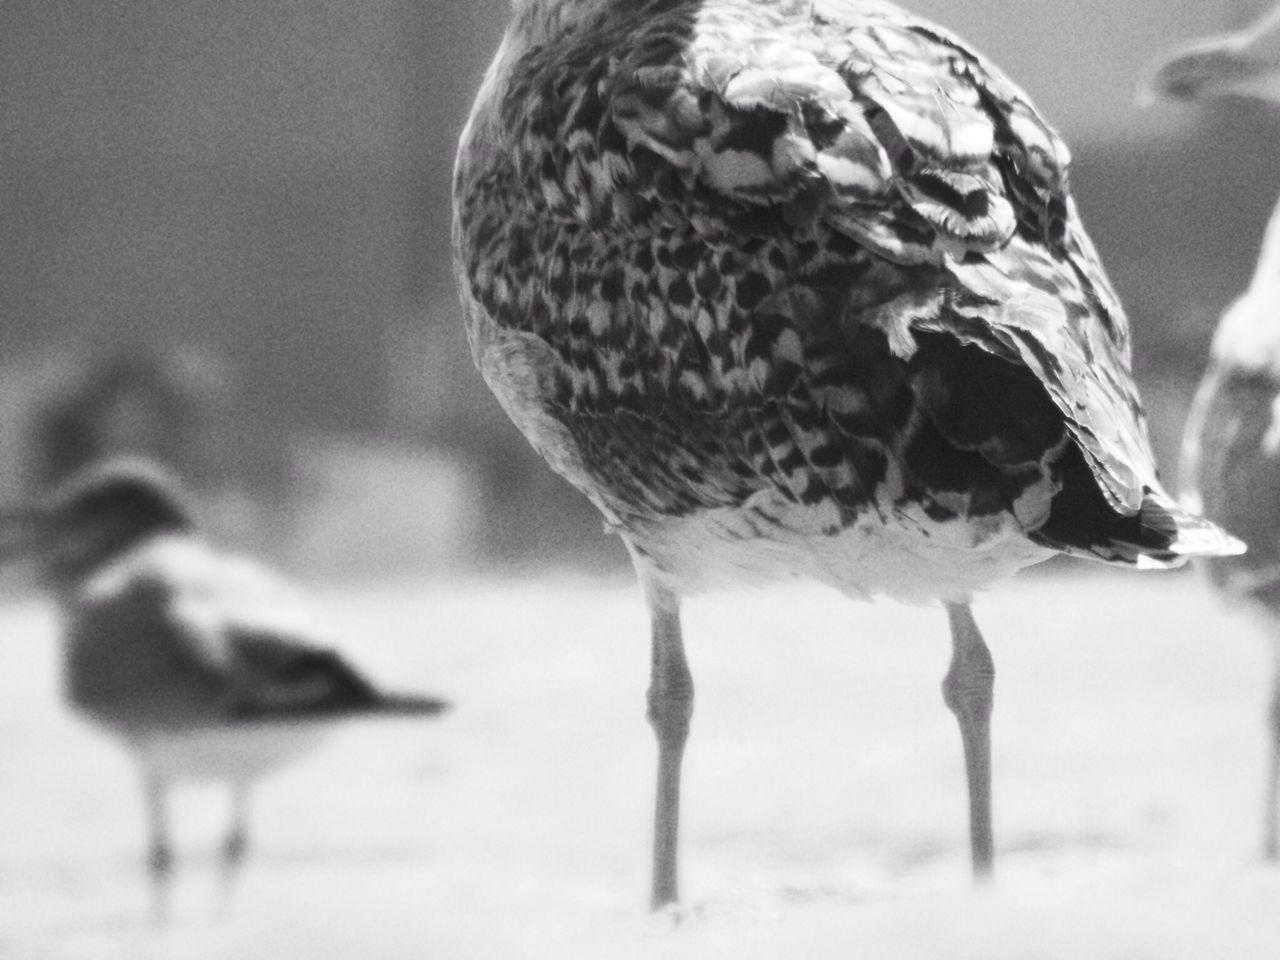 Close-up of seagulls on beach